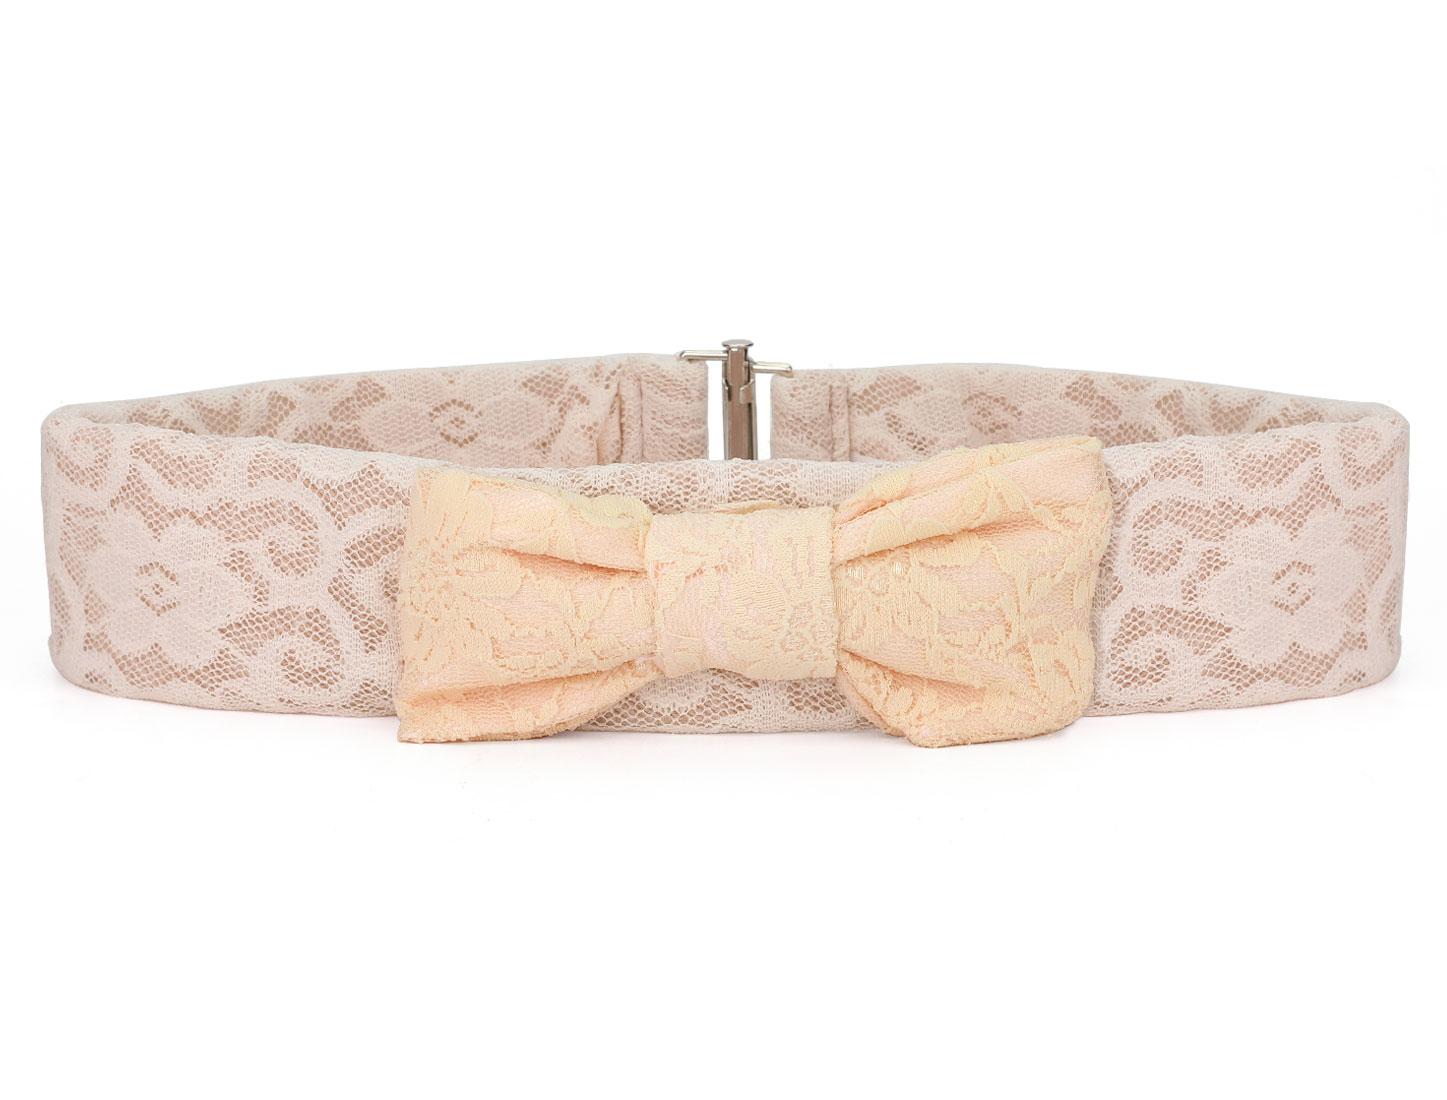 Ladies Light Pink Bowknot Decor Lace Flower Elastic Waist Belt Band 66cm Long